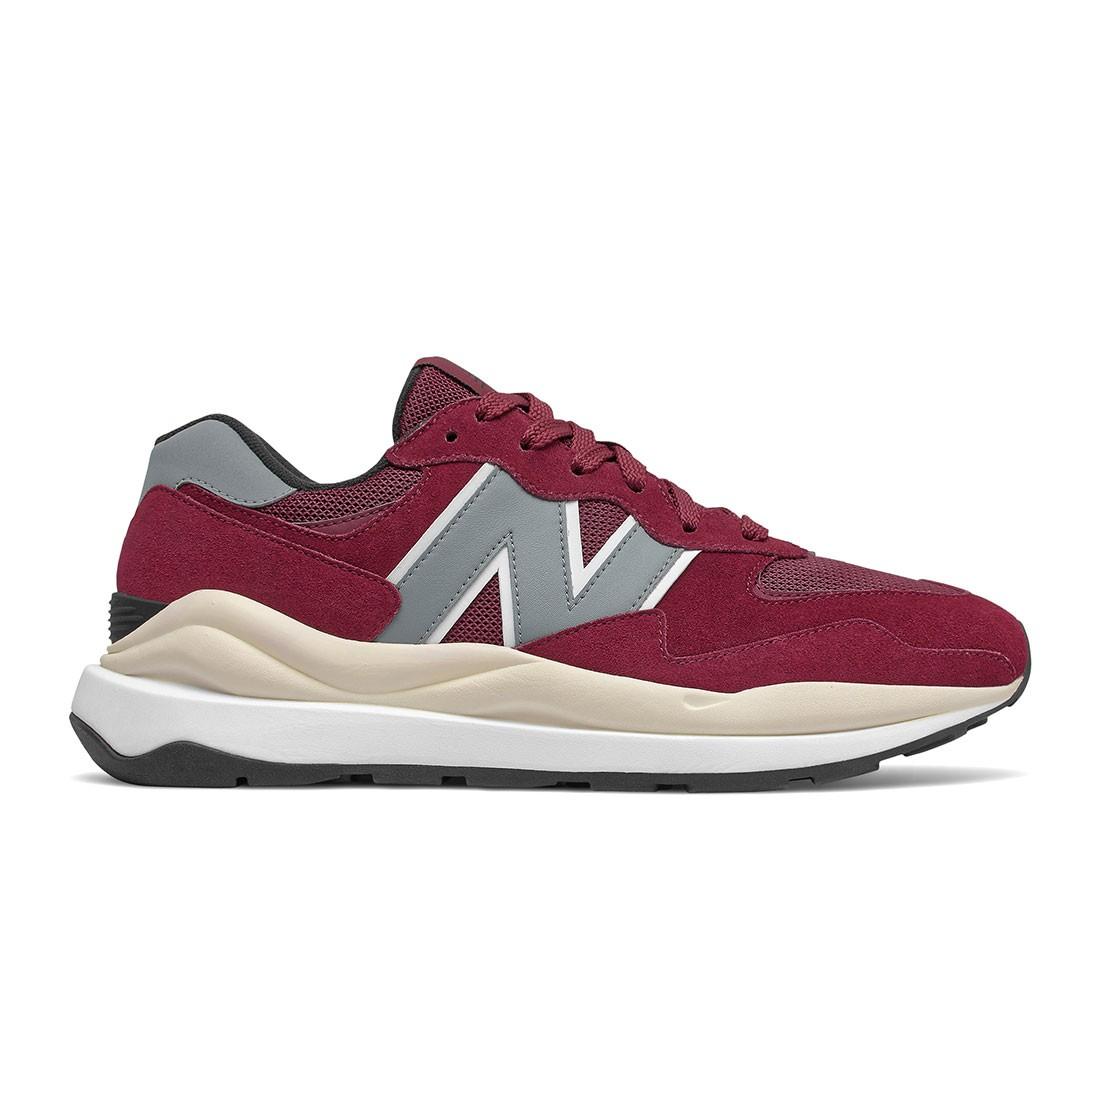 New Balance Men 57/40 M5740HL1 (burgundy / garnet / slate)